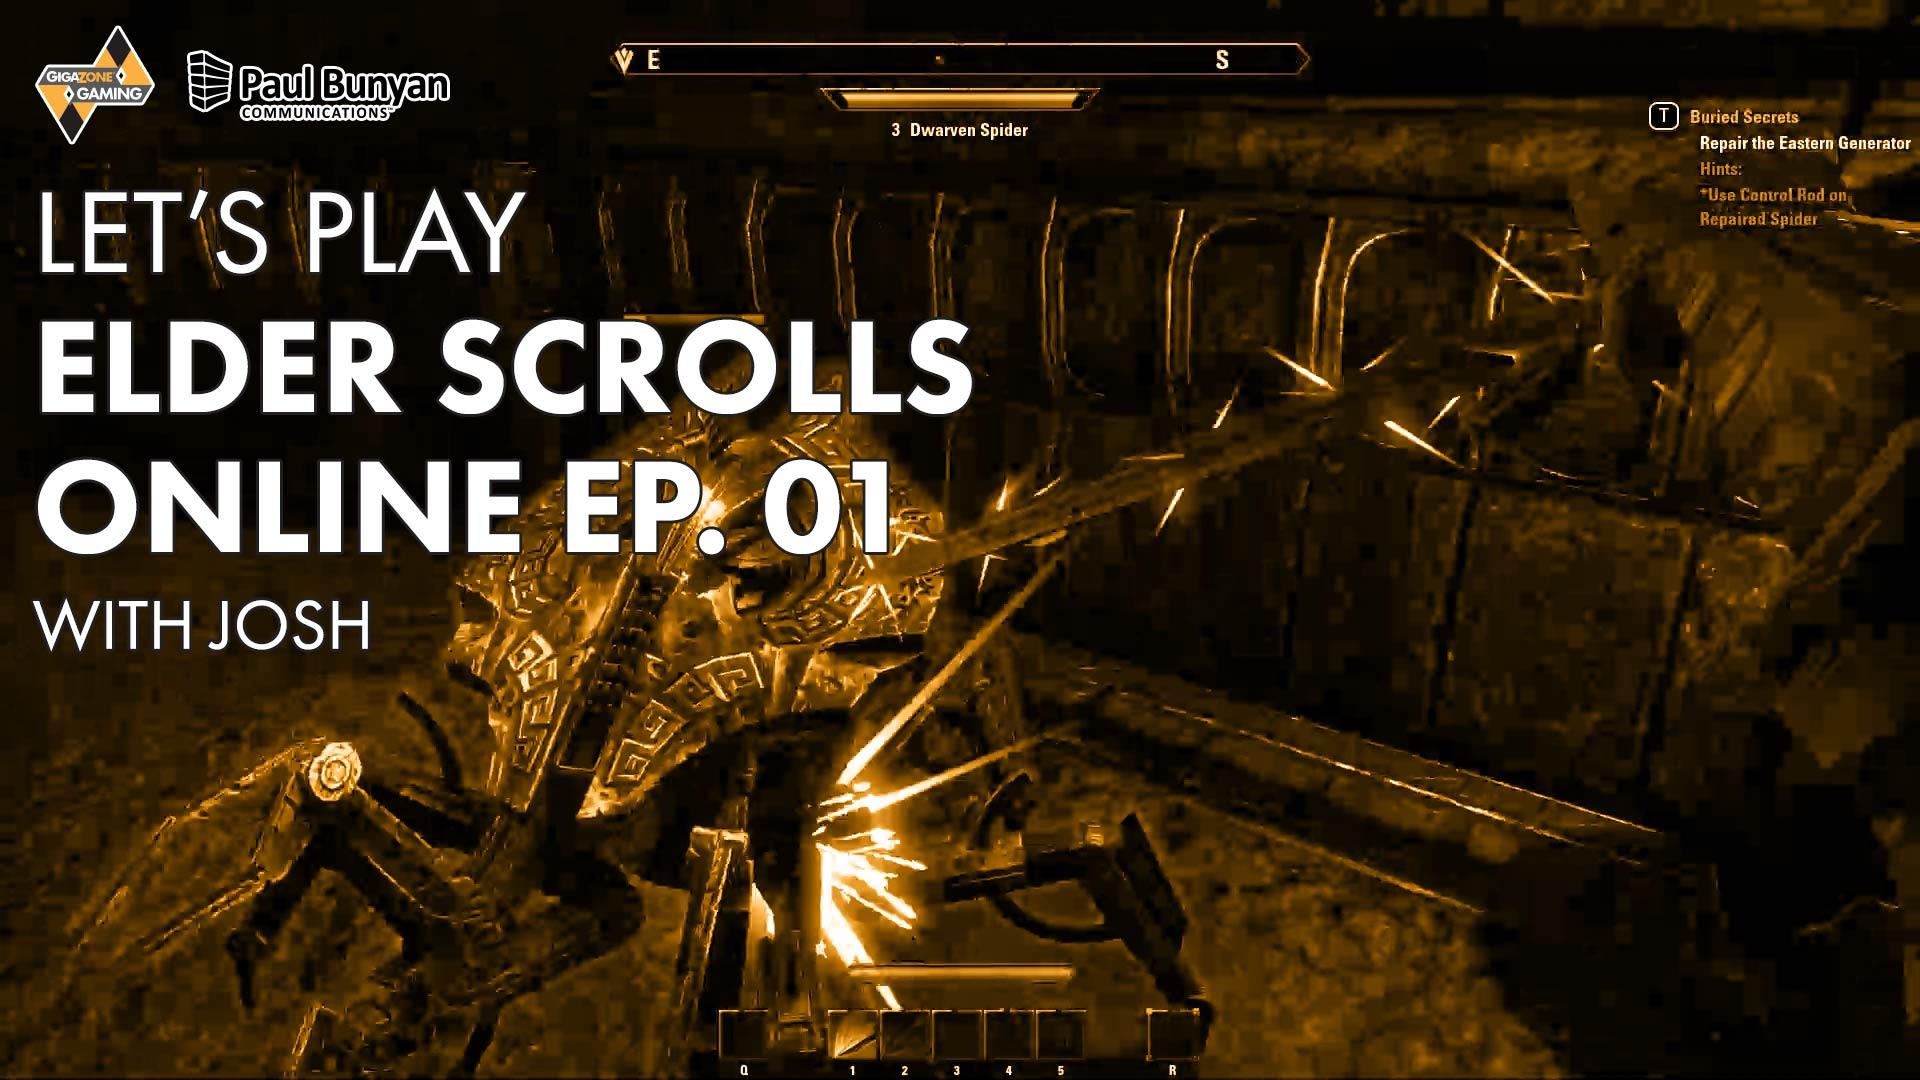 Let's Play Elder Scrolls Online Ep  1 with Josh » GigaZone